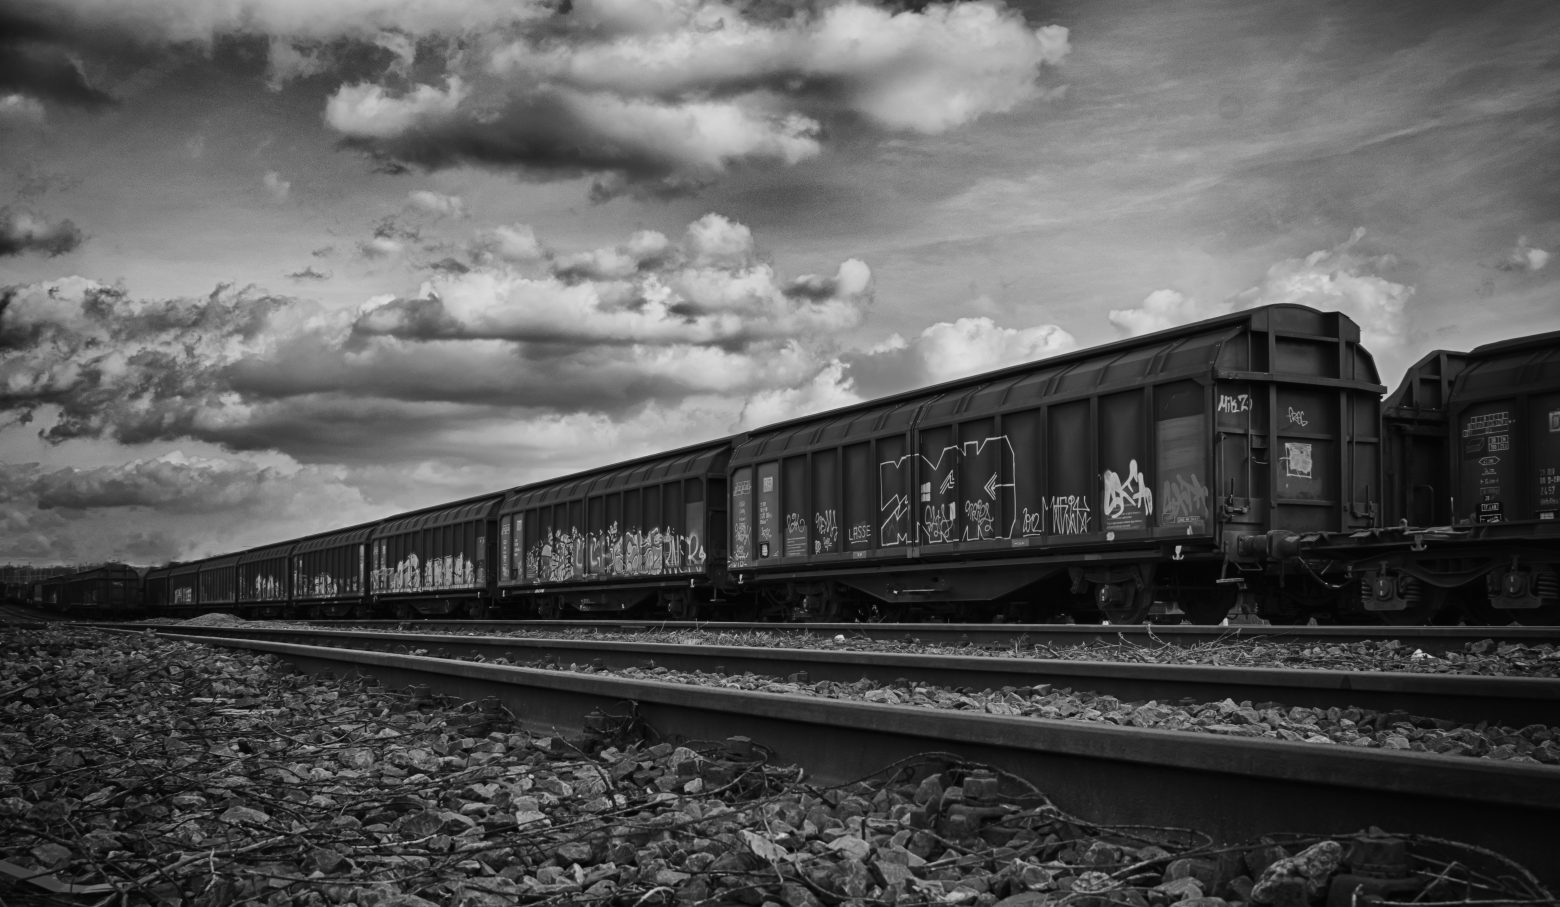 railway-station-2114857